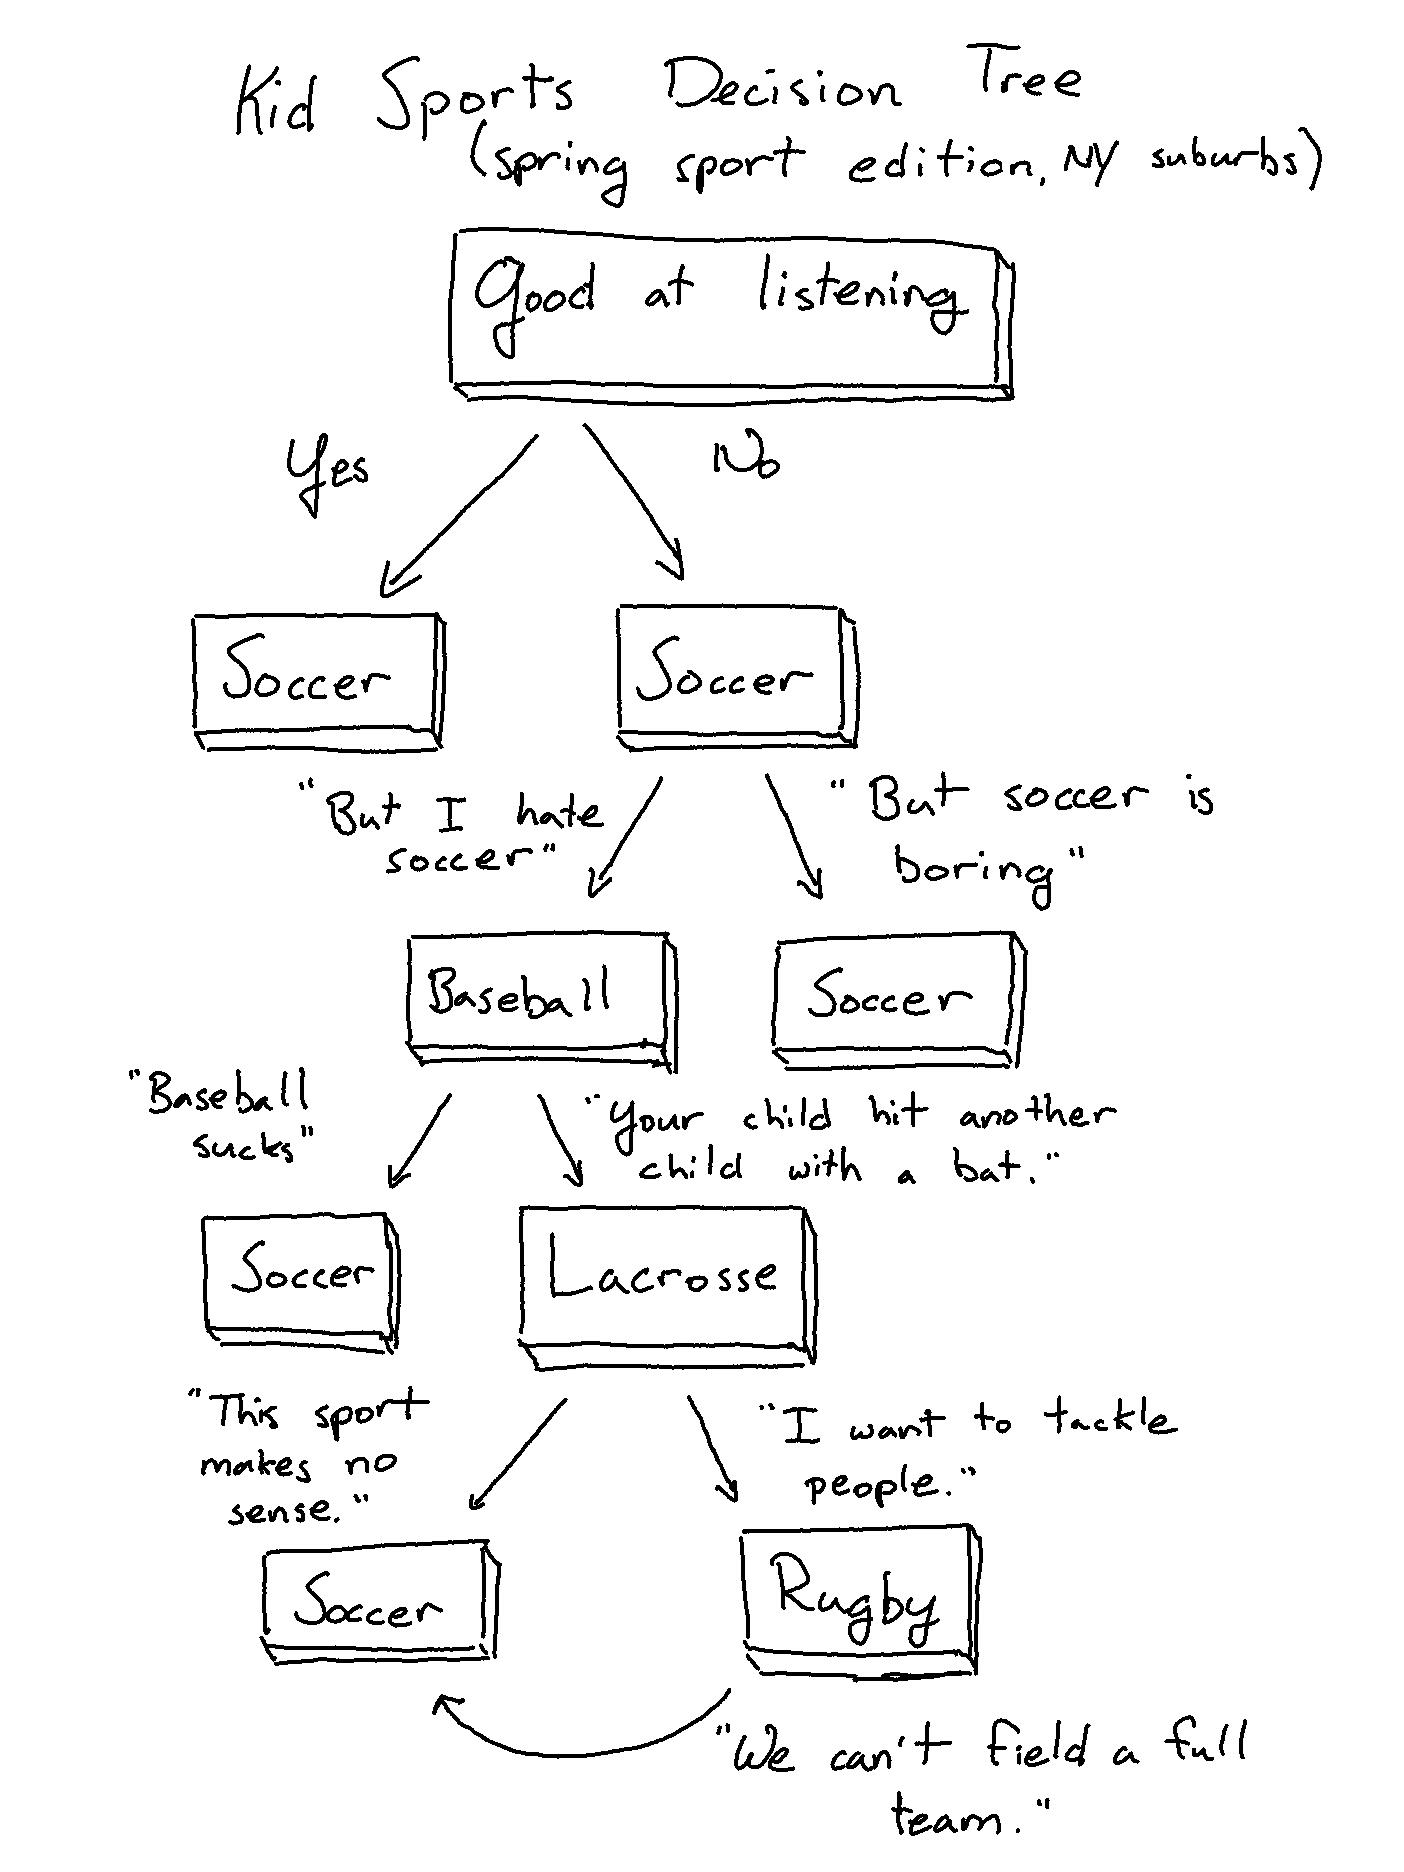 suburban sports decision tree